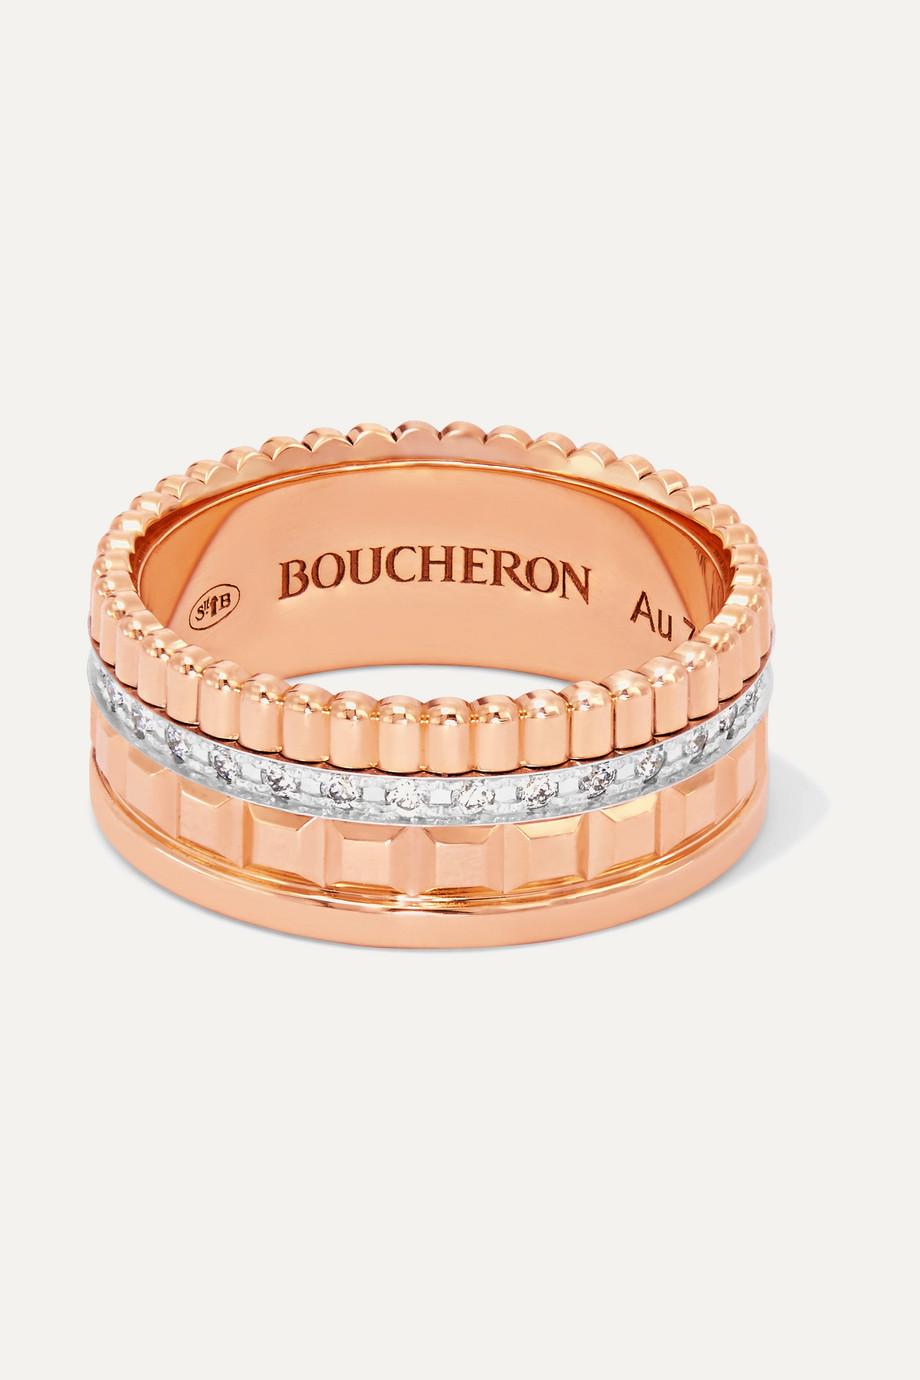 Boucheron Quatre Radiant Edition Small 18K 玫瑰金、18K 白金、钻石戒指